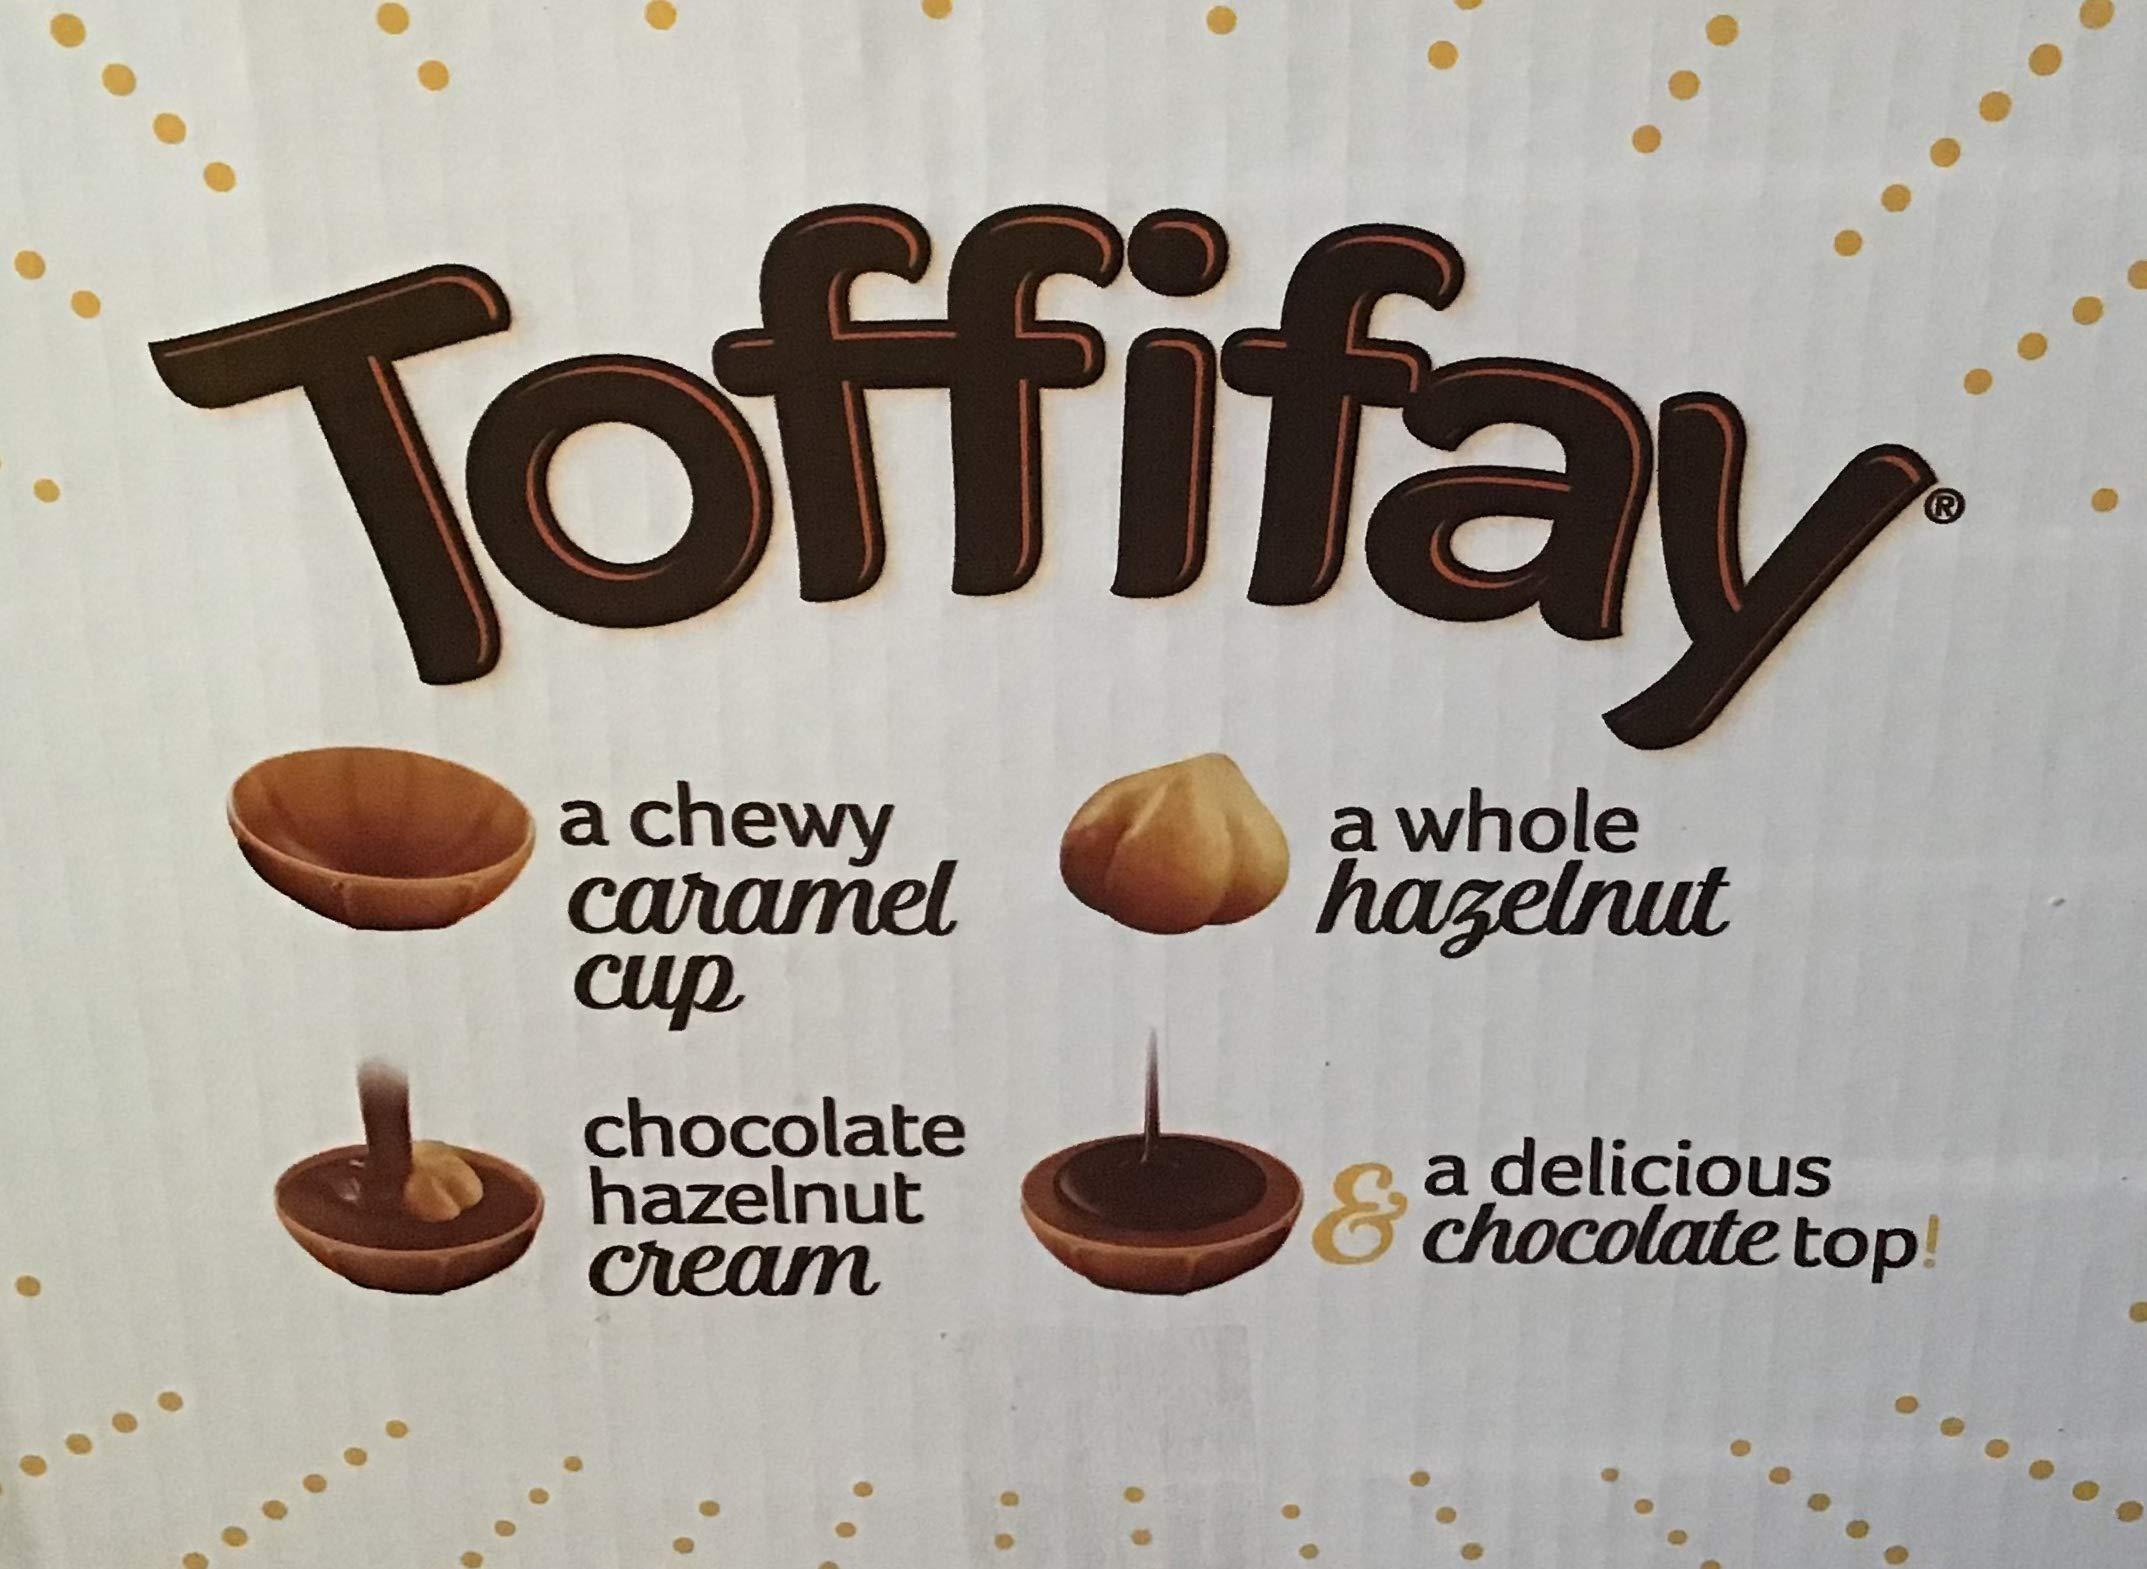 Toffifay Hazelnut Chewy Caramel , 21 Count (CHOC. CANDY - REGULAR SIZE)